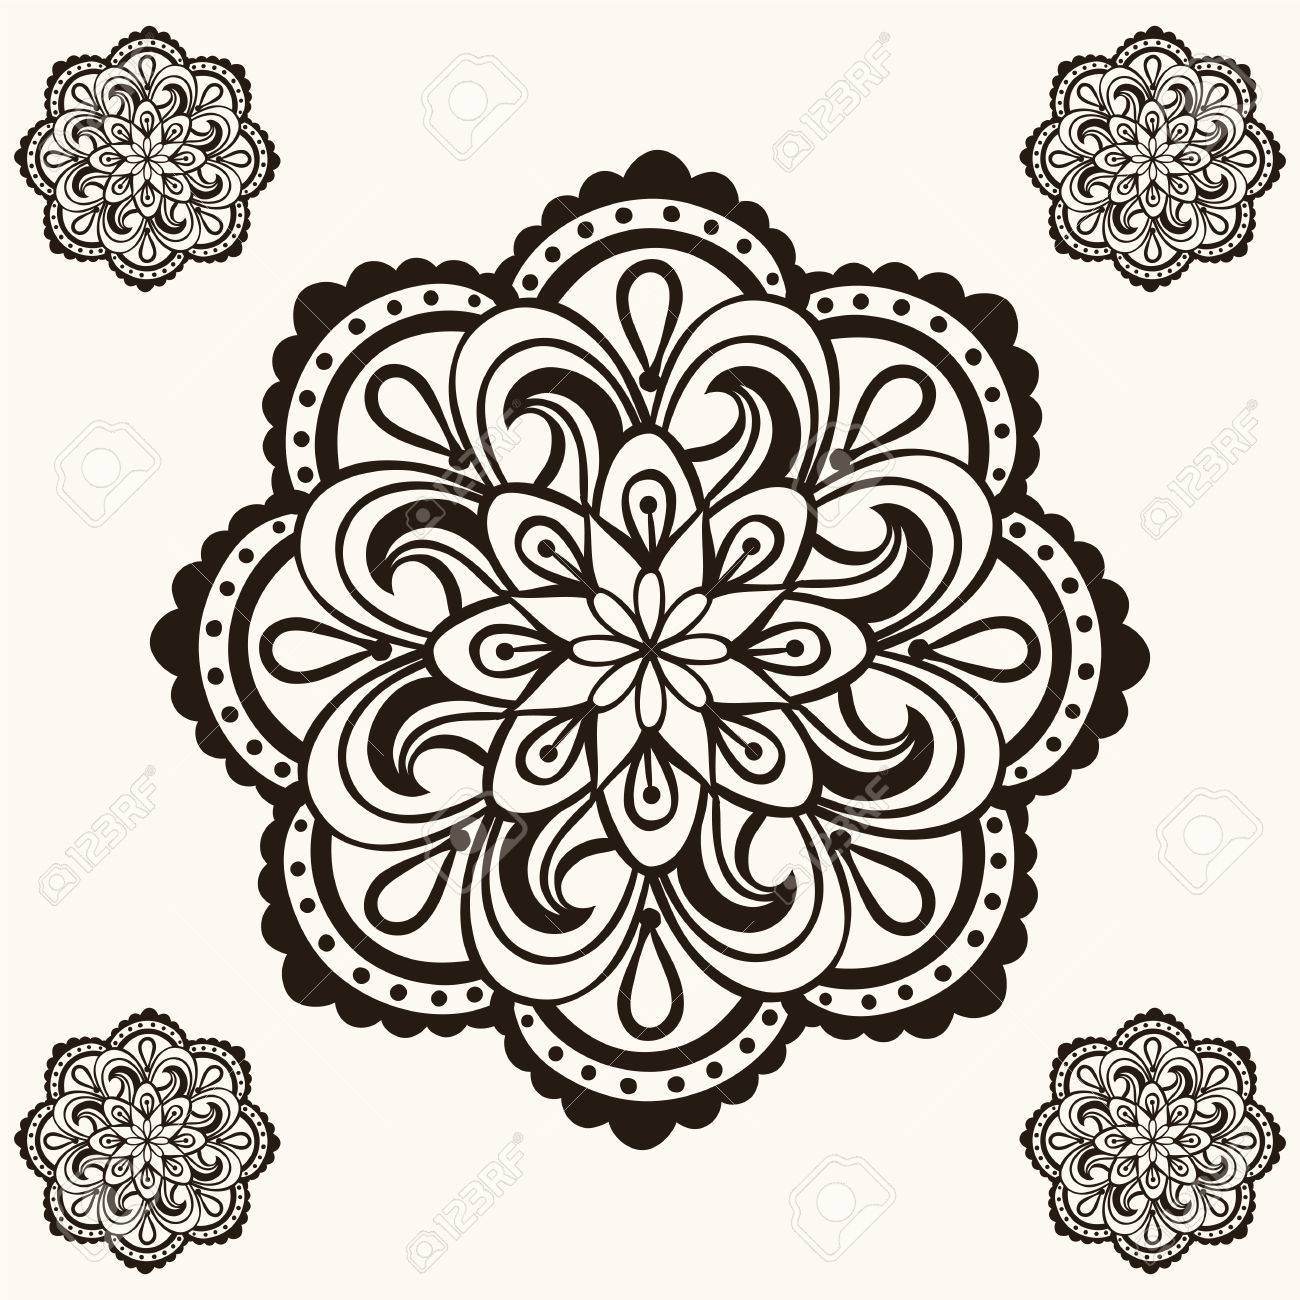 Mandalas Henna Vector Diseo Del Tatuaje Boho En El Estilo De